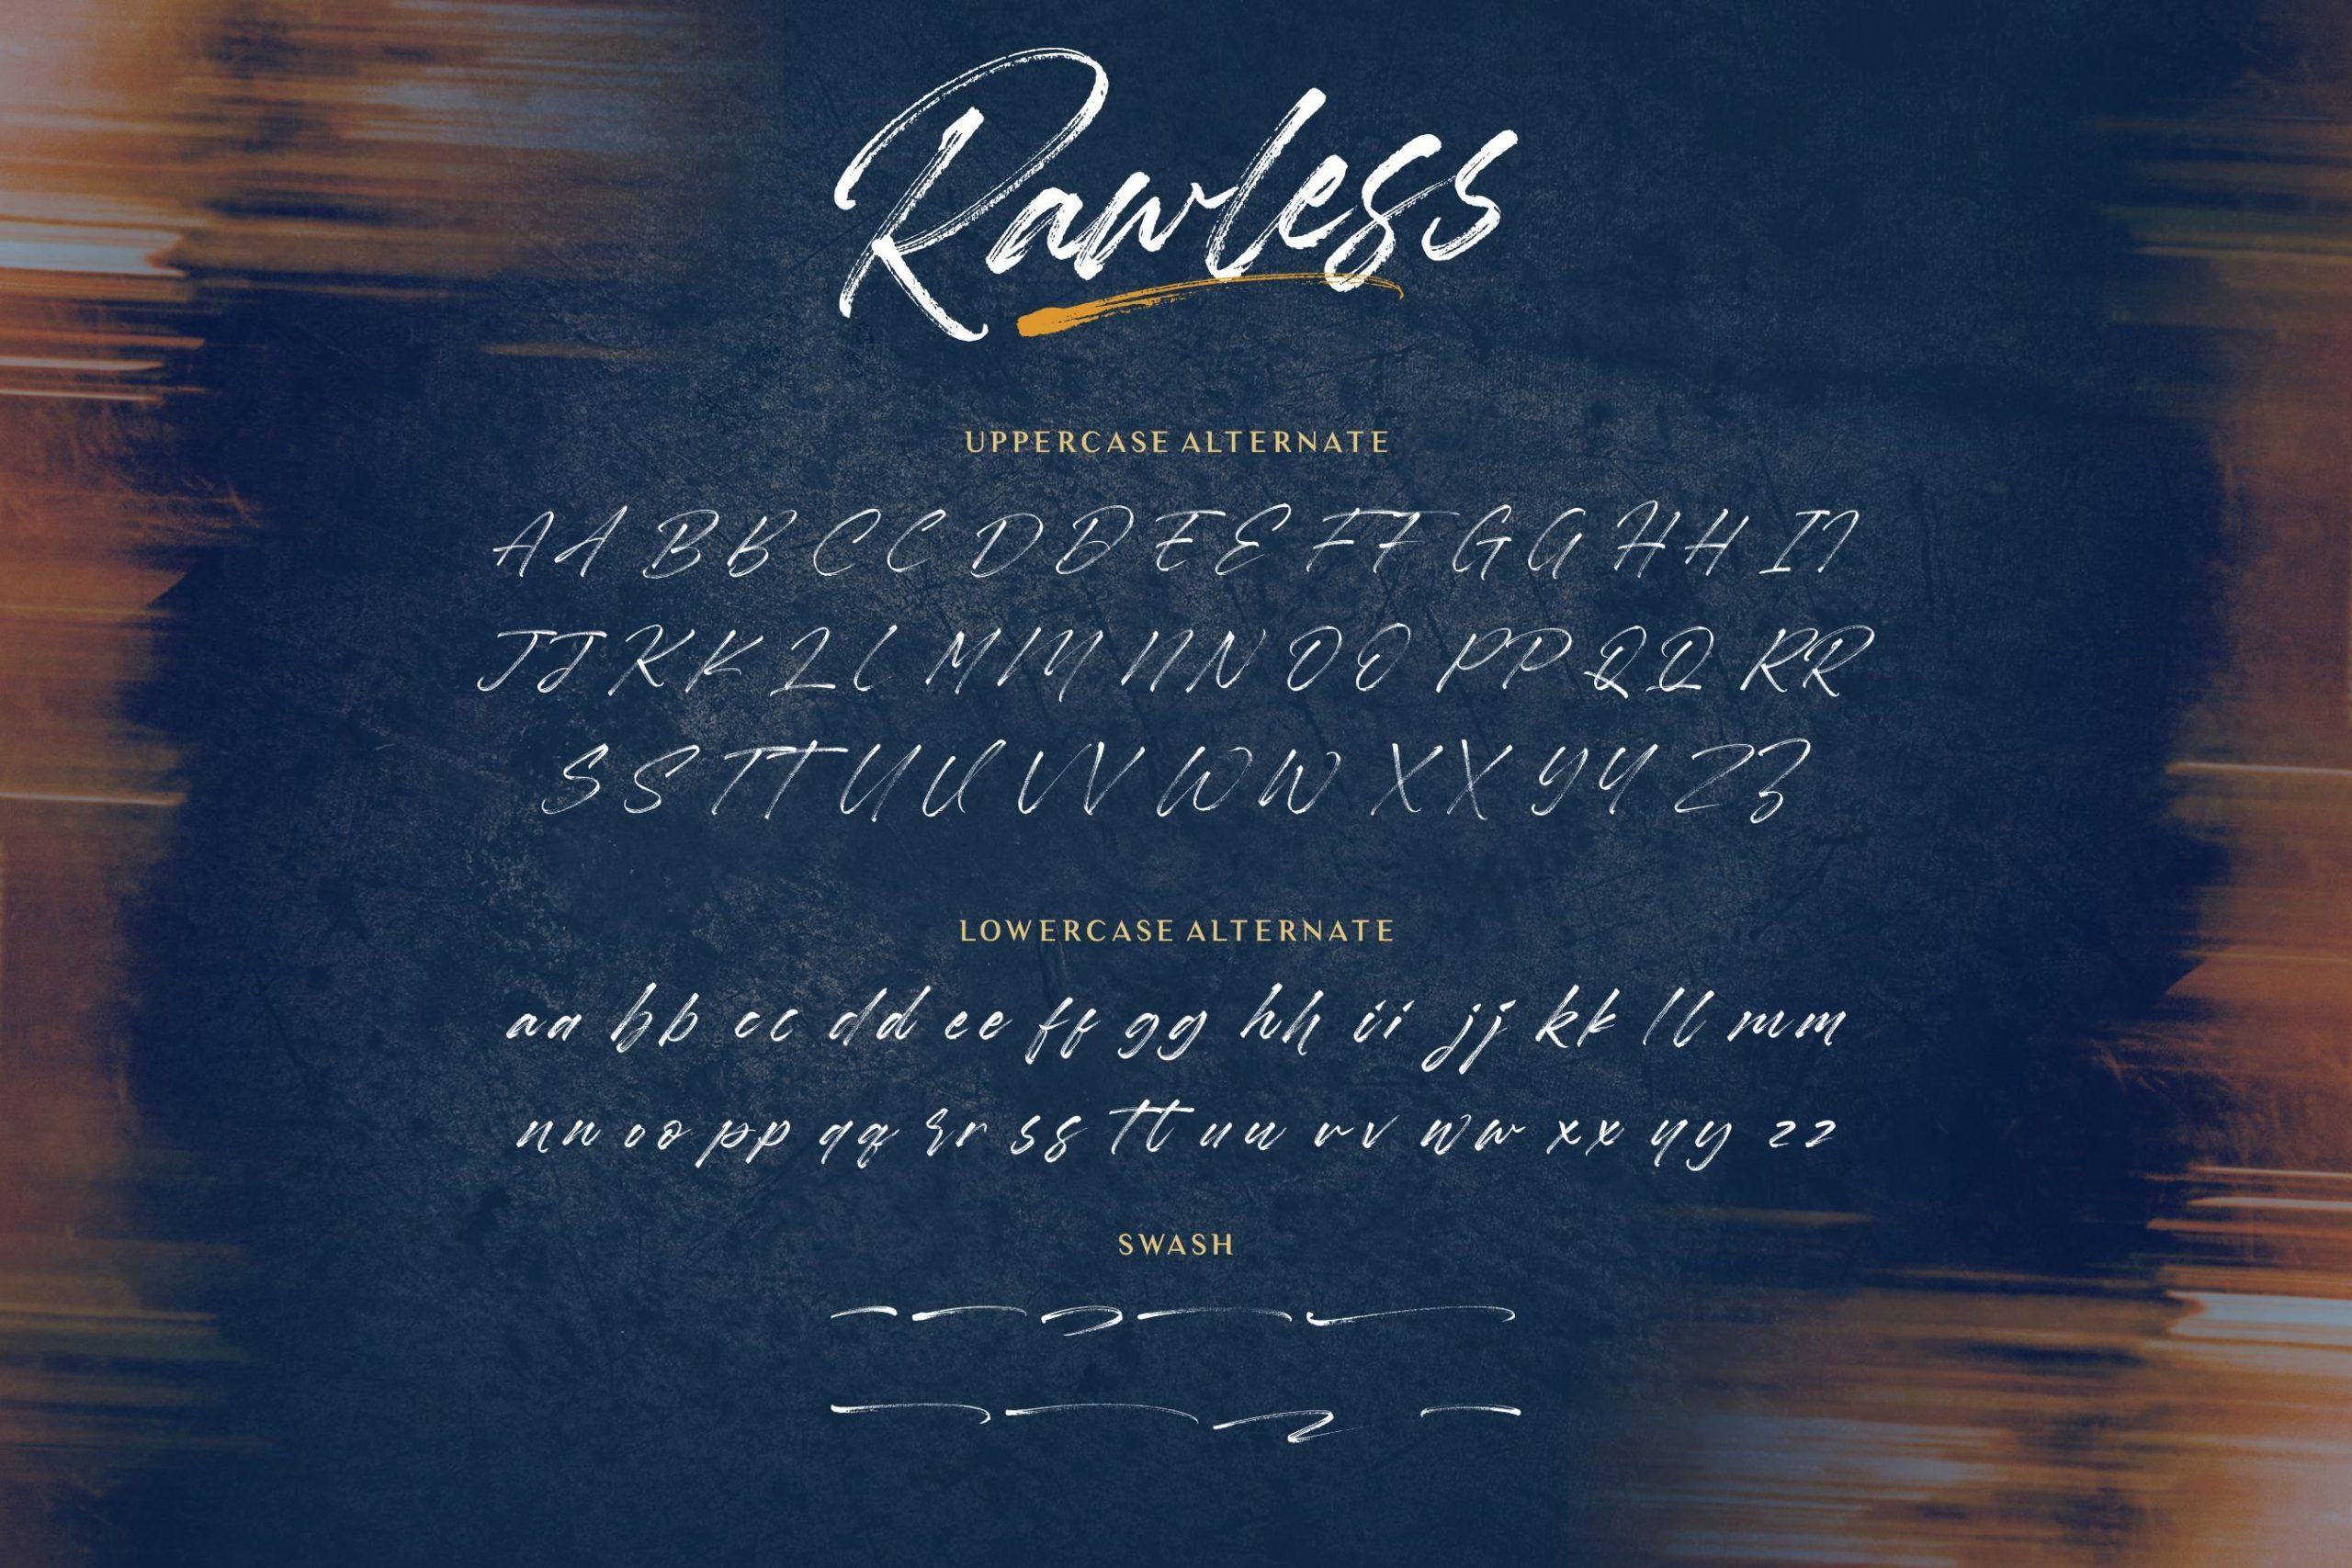 Rawless6